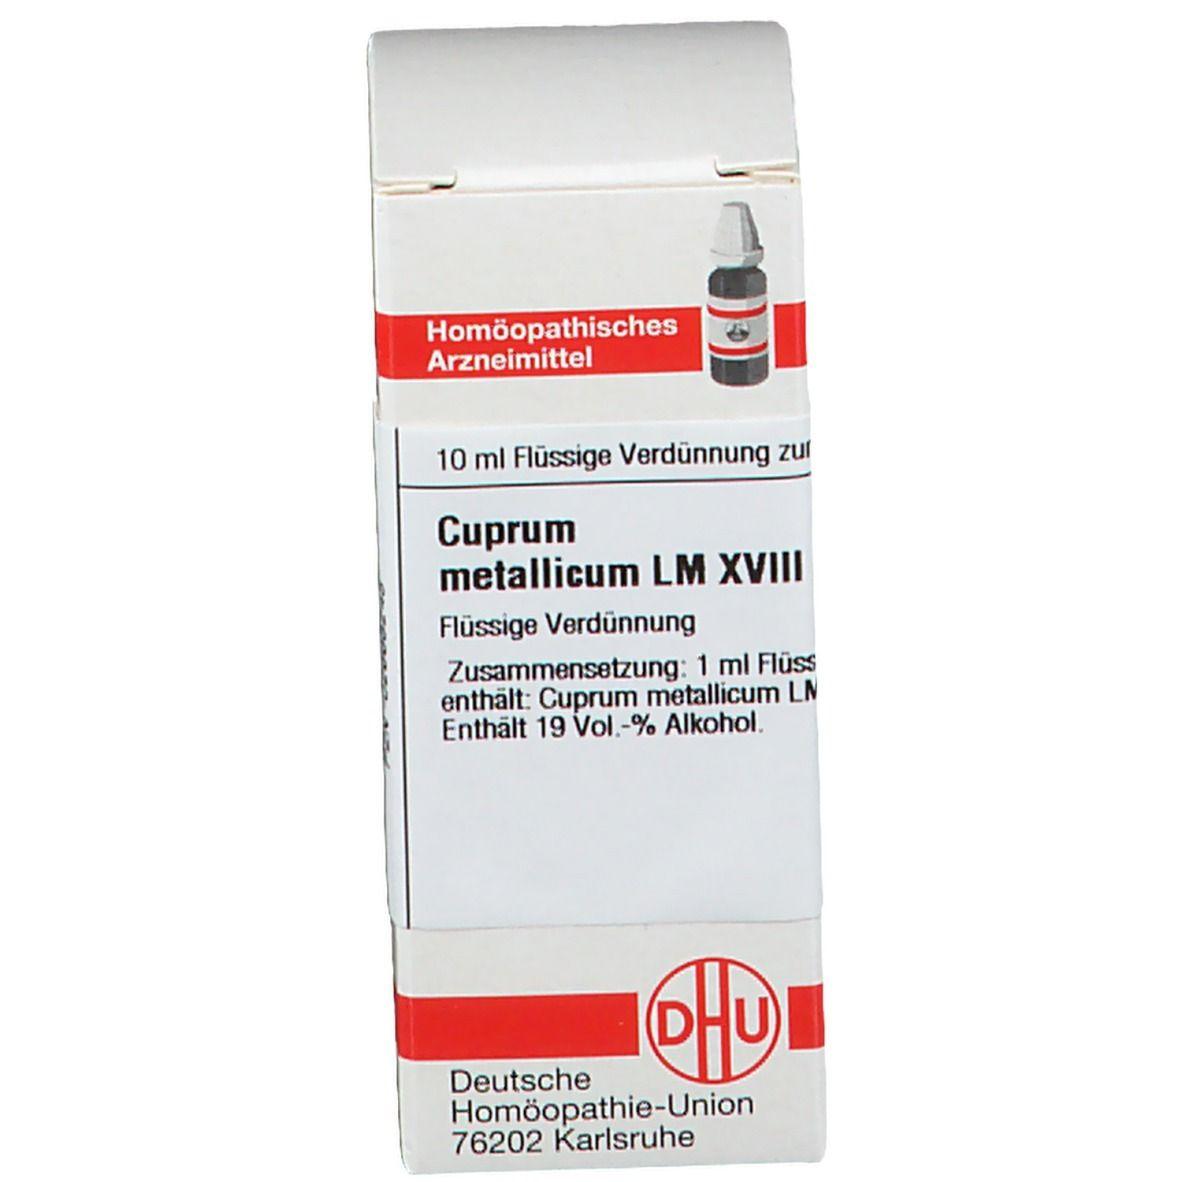 DHU Cuprum Metallicum LM XVIII